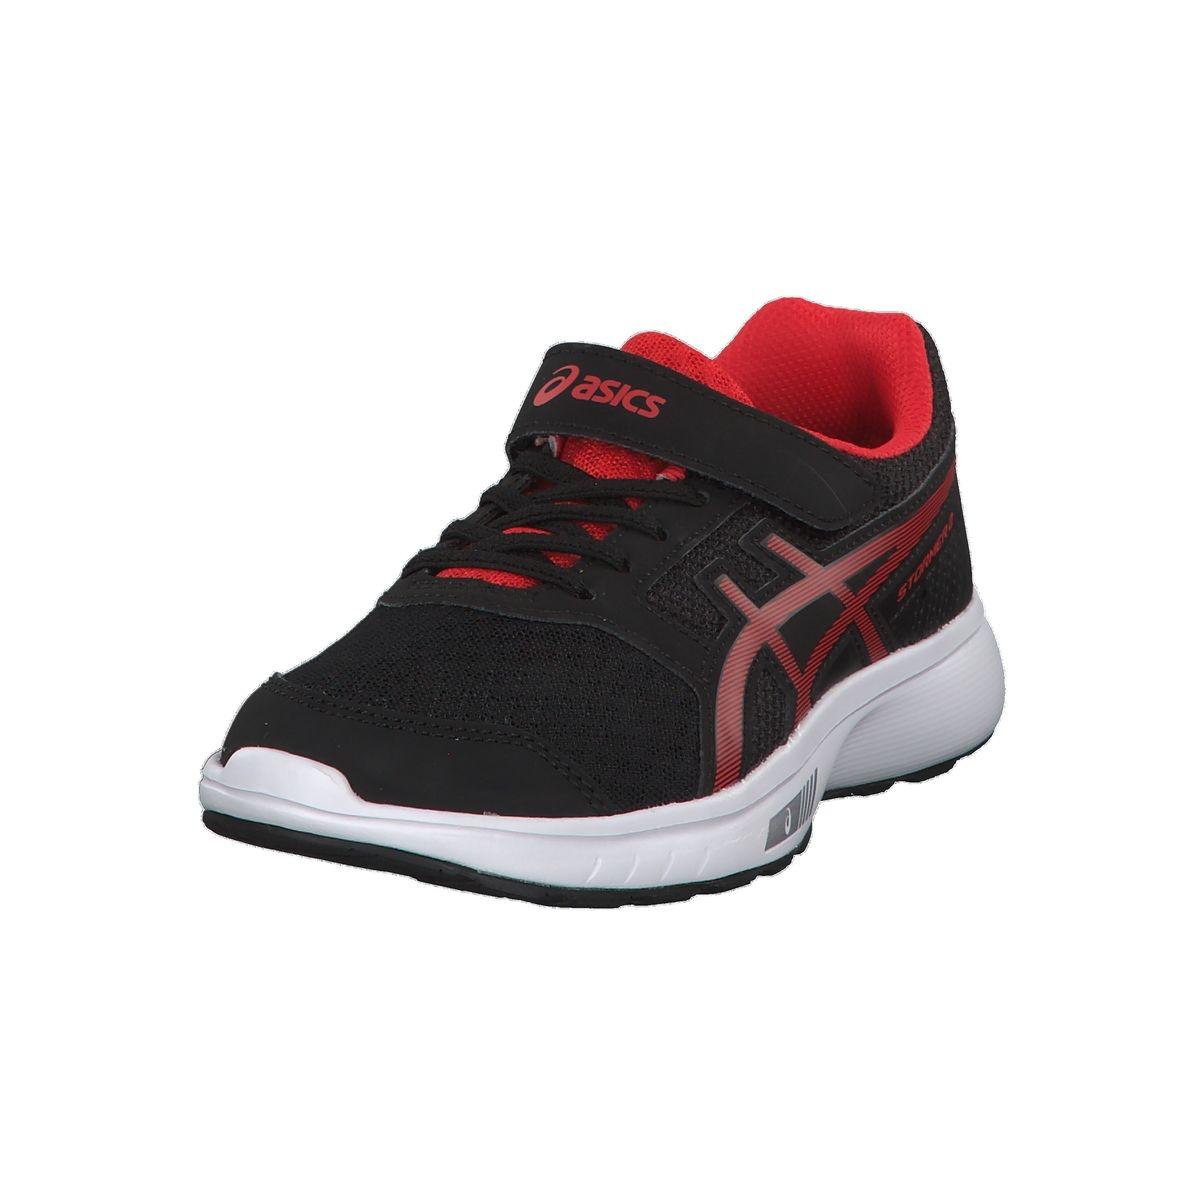 Chaussures de course Stormer